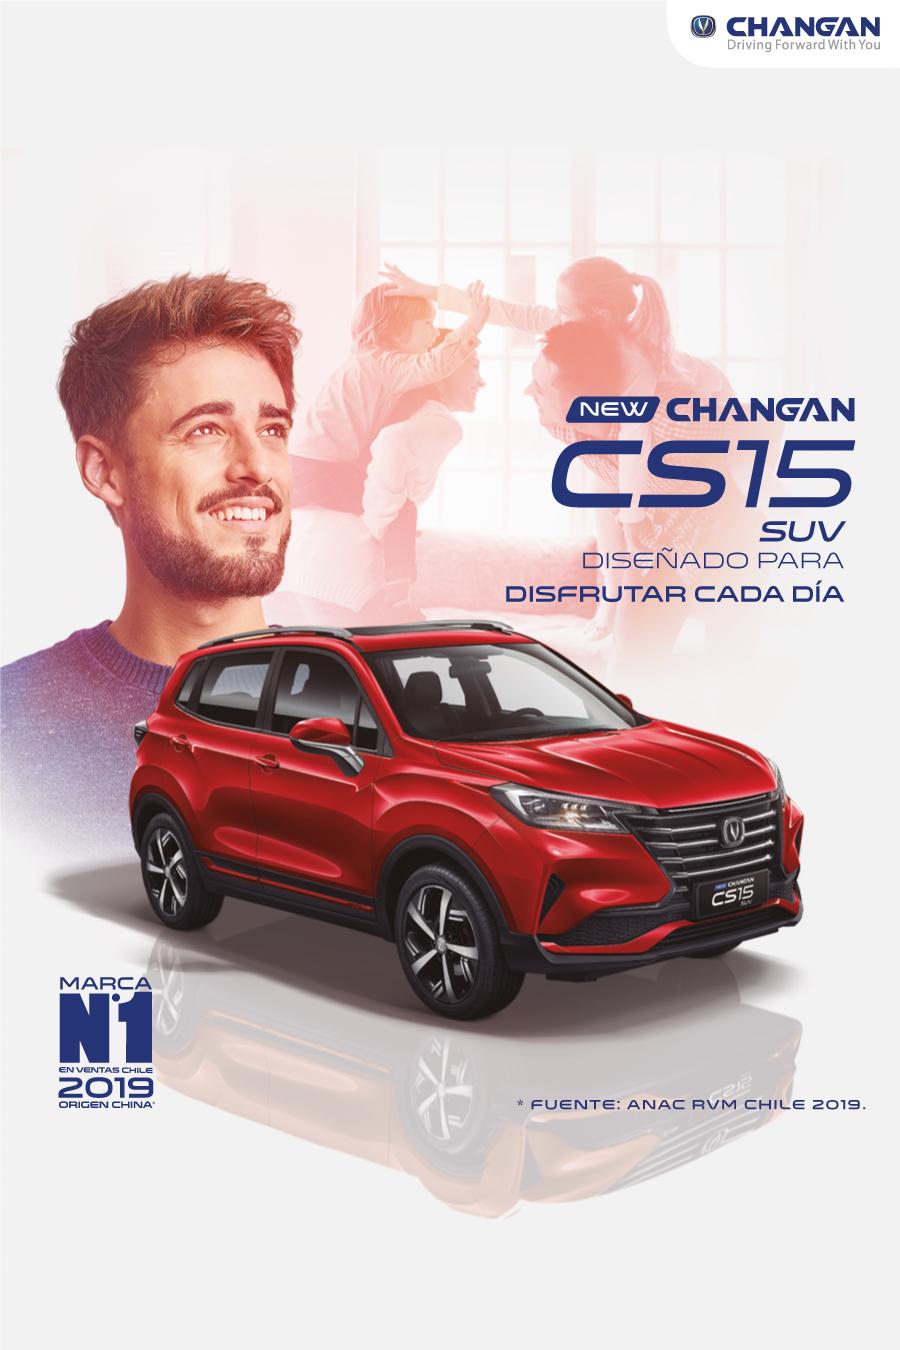 Changan New CS15